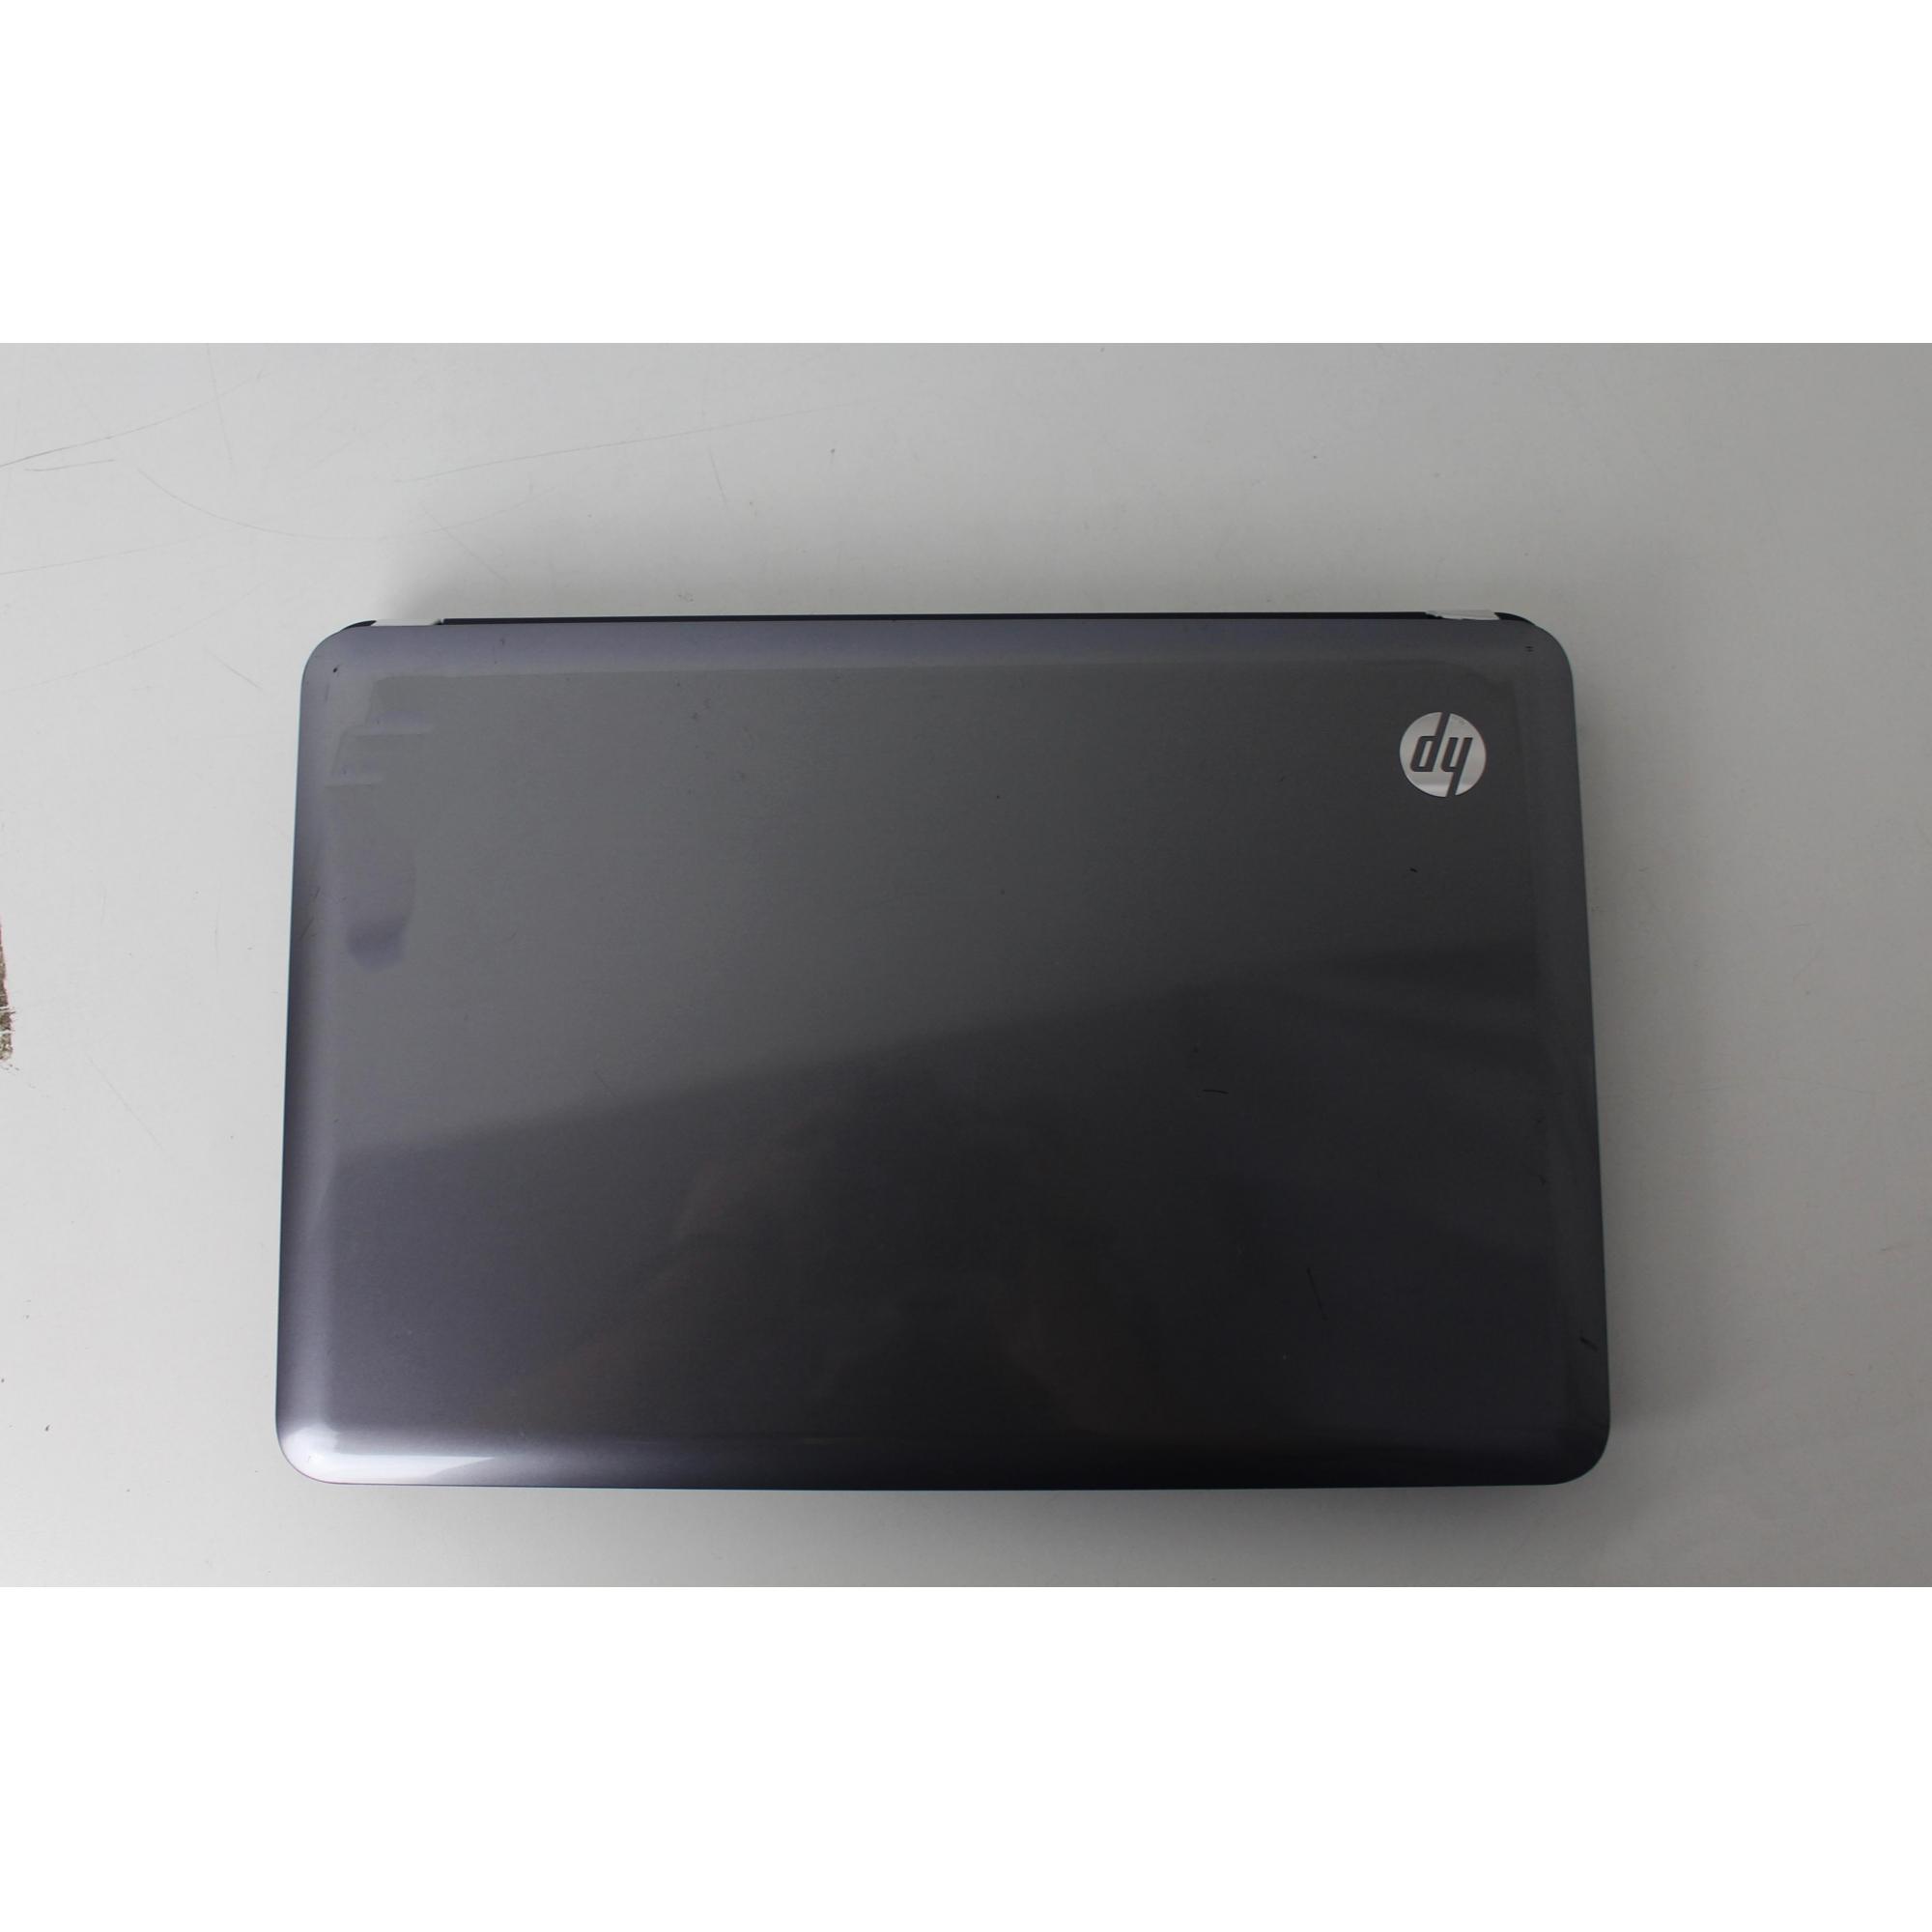 "NOTEBOOK HP PAVILION G4-1110BR 14"" INTEL PENTIUM 4GB HD-500GB"